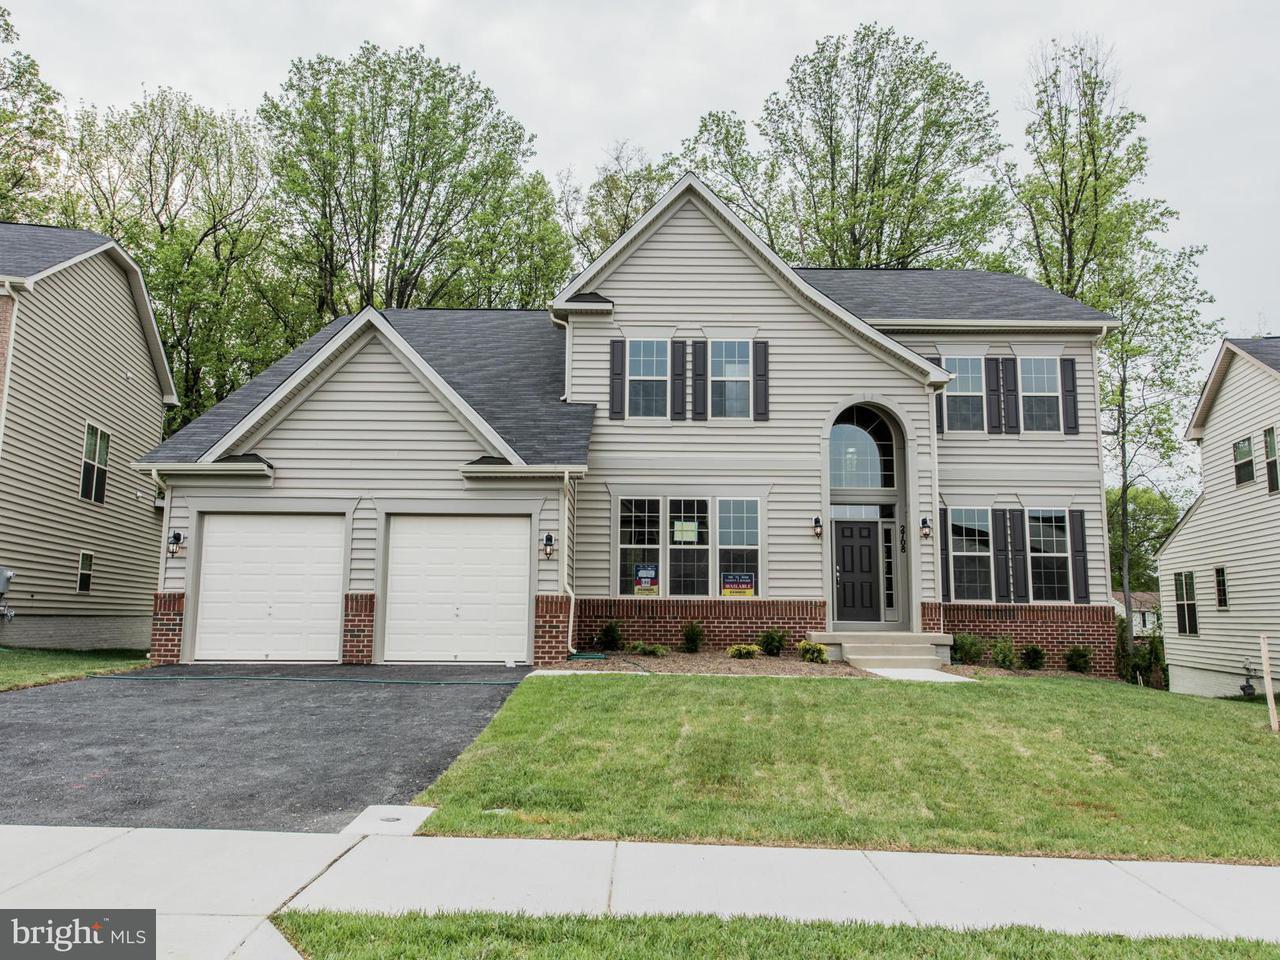 Villa per Vendita alle ore 2402 ST. NICHOLAS WAY 2402 ST. NICHOLAS WAY Glenarden, Maryland 20706 Stati Uniti